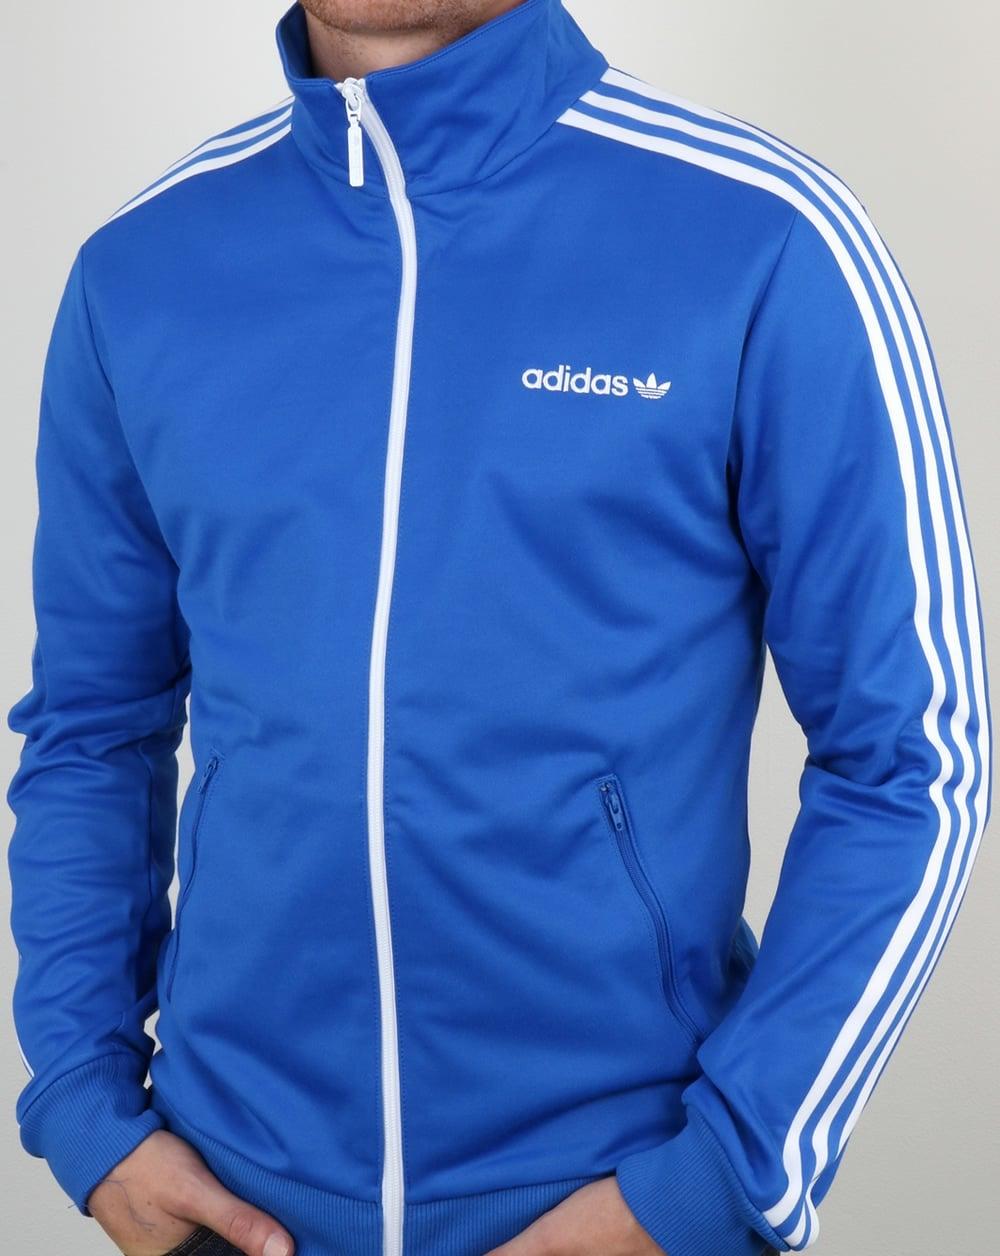 Adidas Beckenbauer, Track Top, Blue